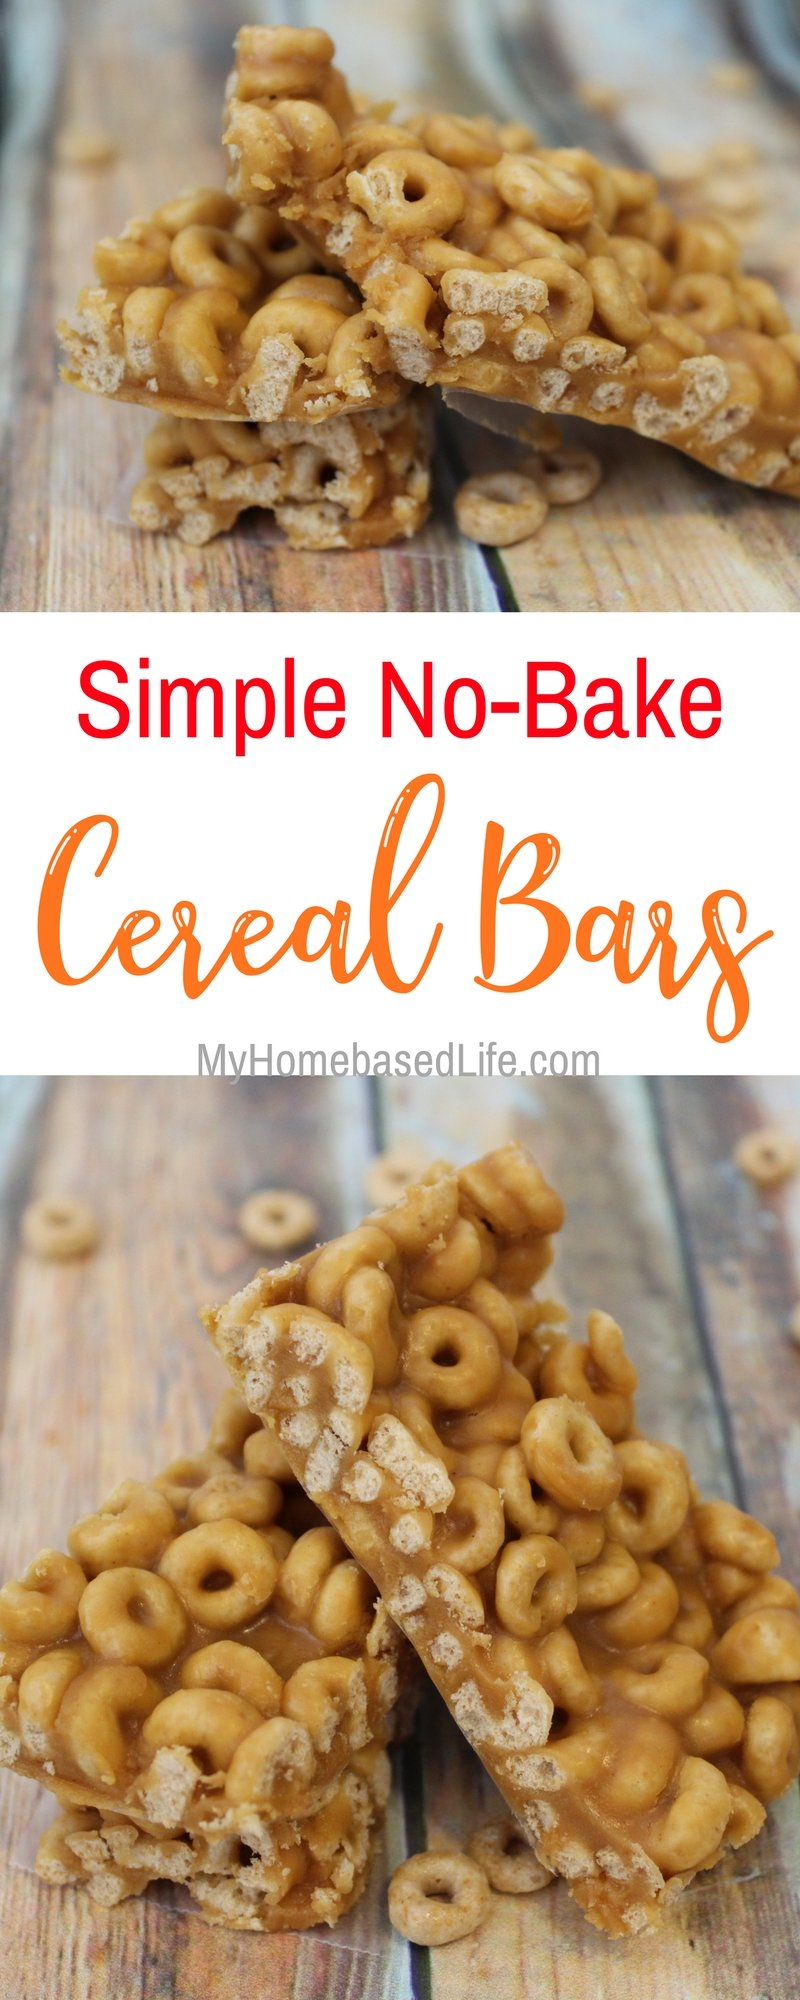 Box Tops For Education + No-Bake Cereal Bars Recipe